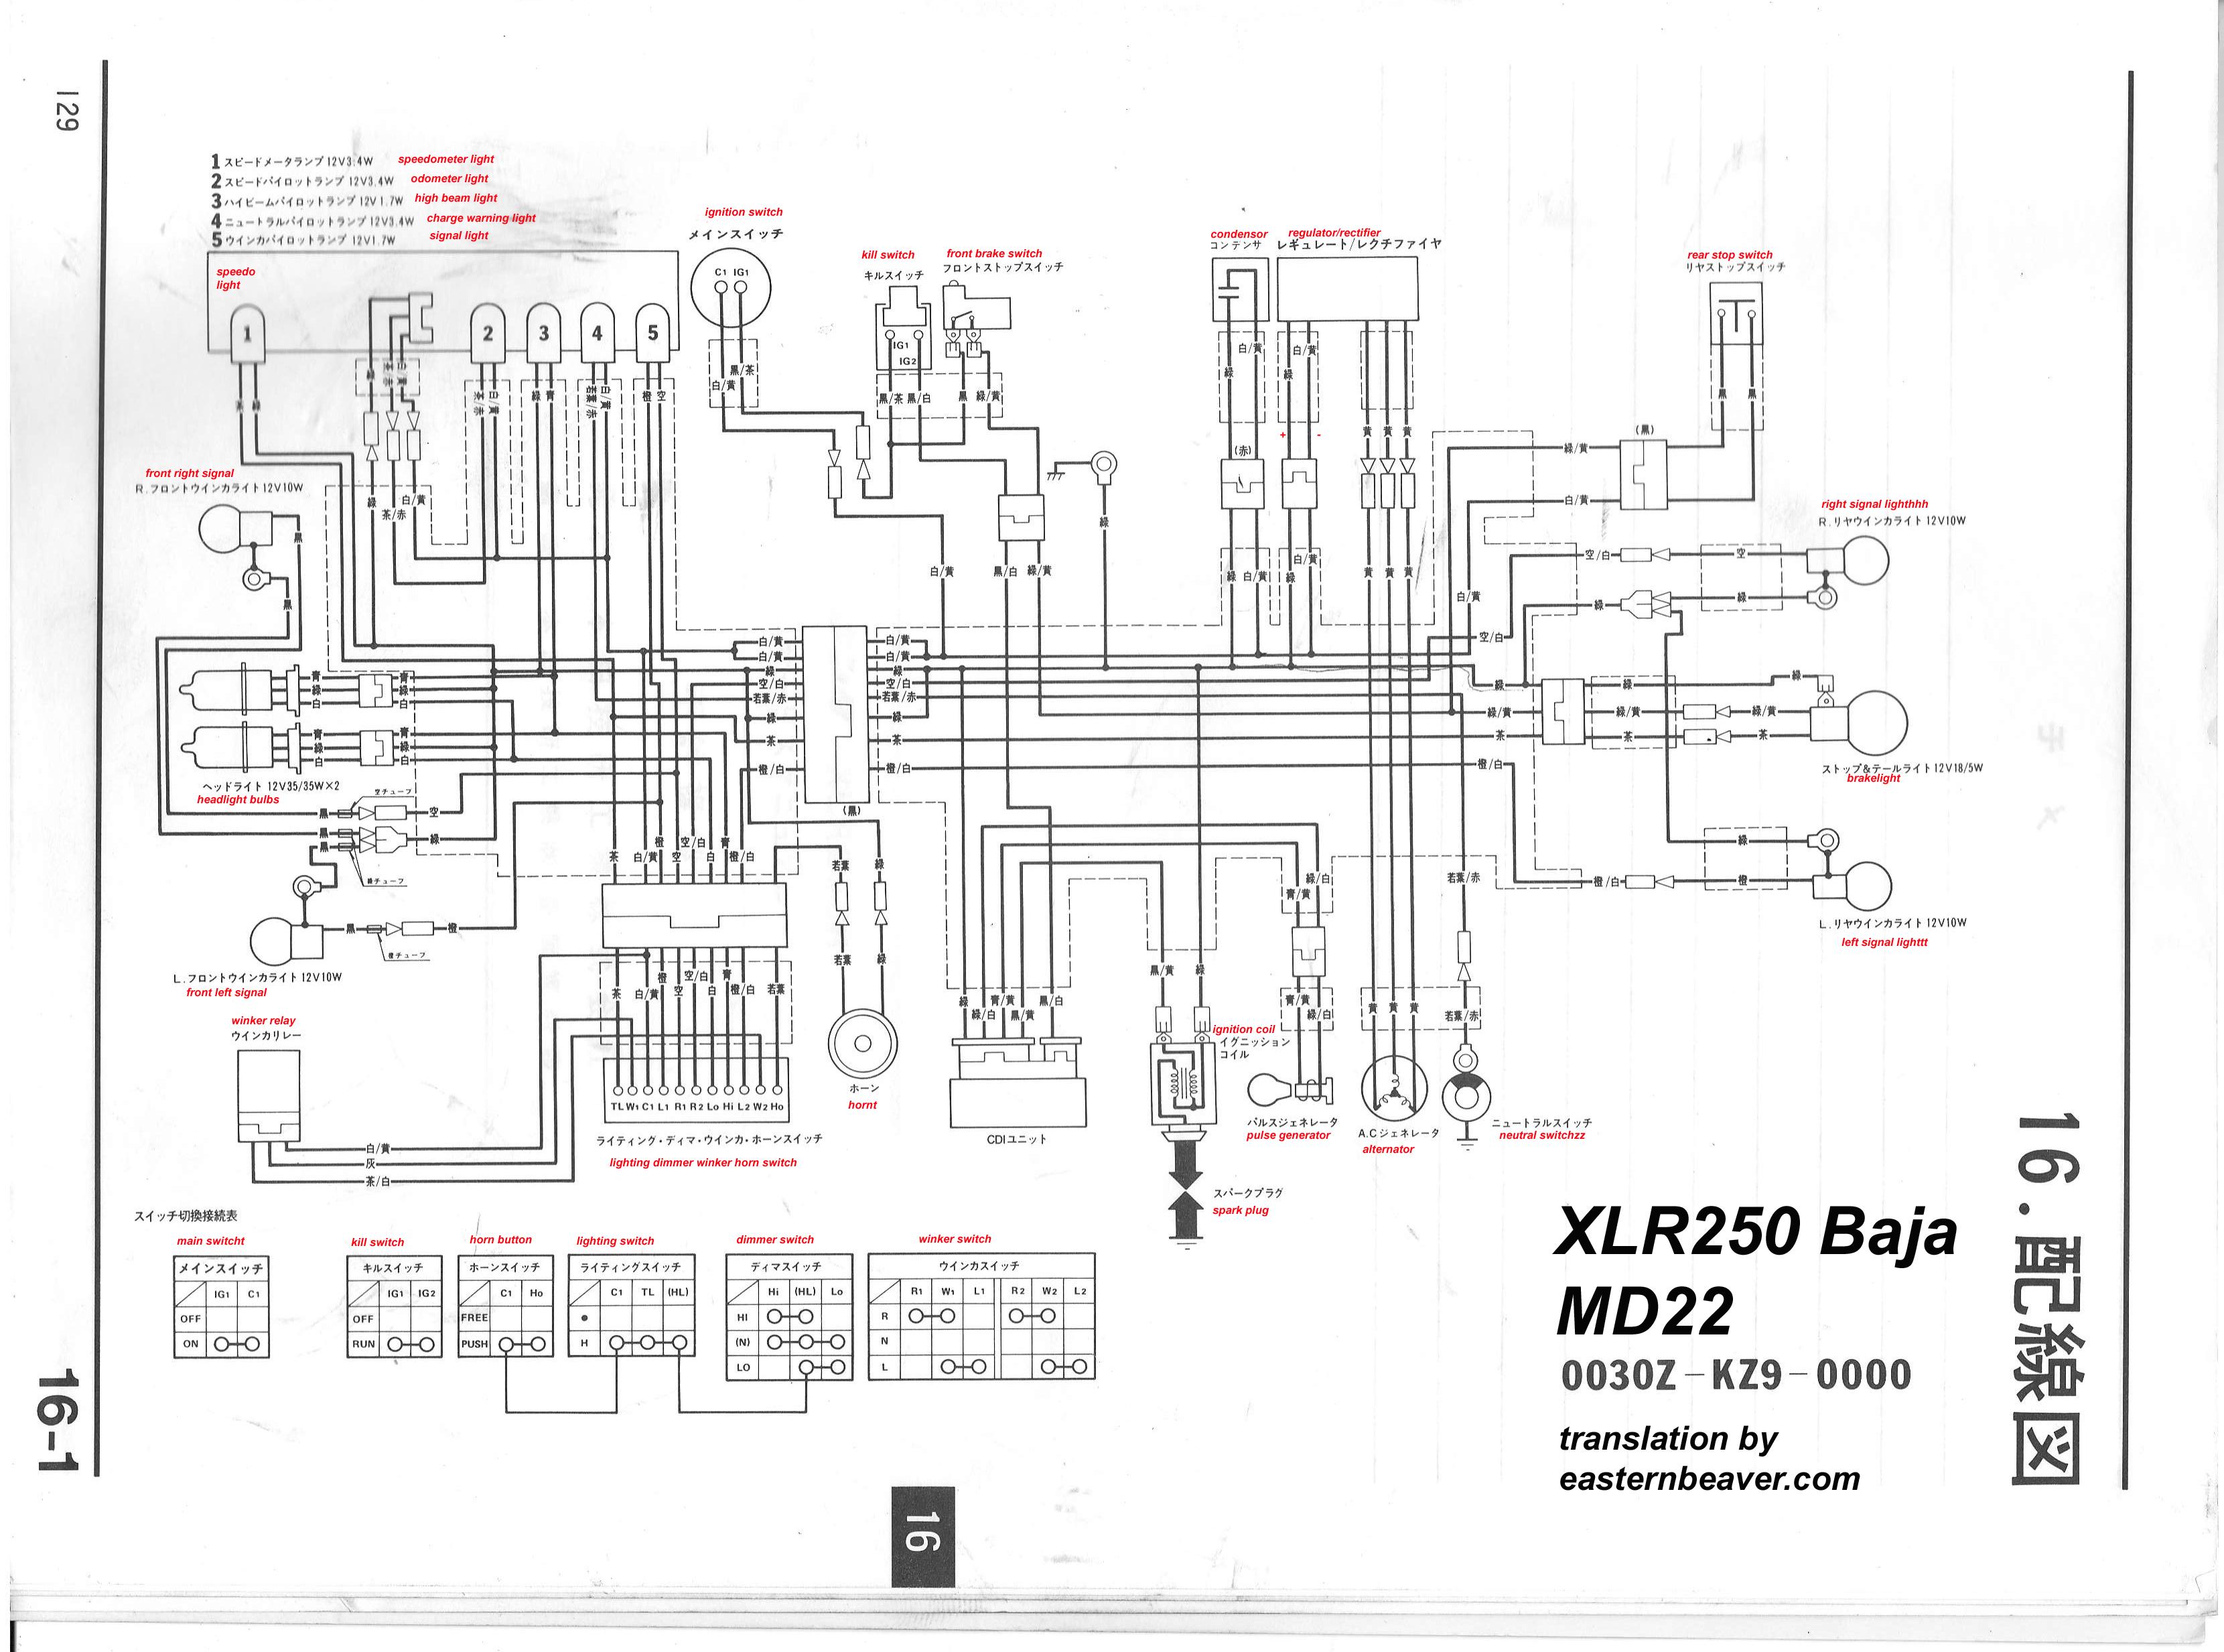 linhai atv wiring diagram gn 2875  diagram further linhai 260 atv wiring diagram together  linhai 260 atv wiring diagram